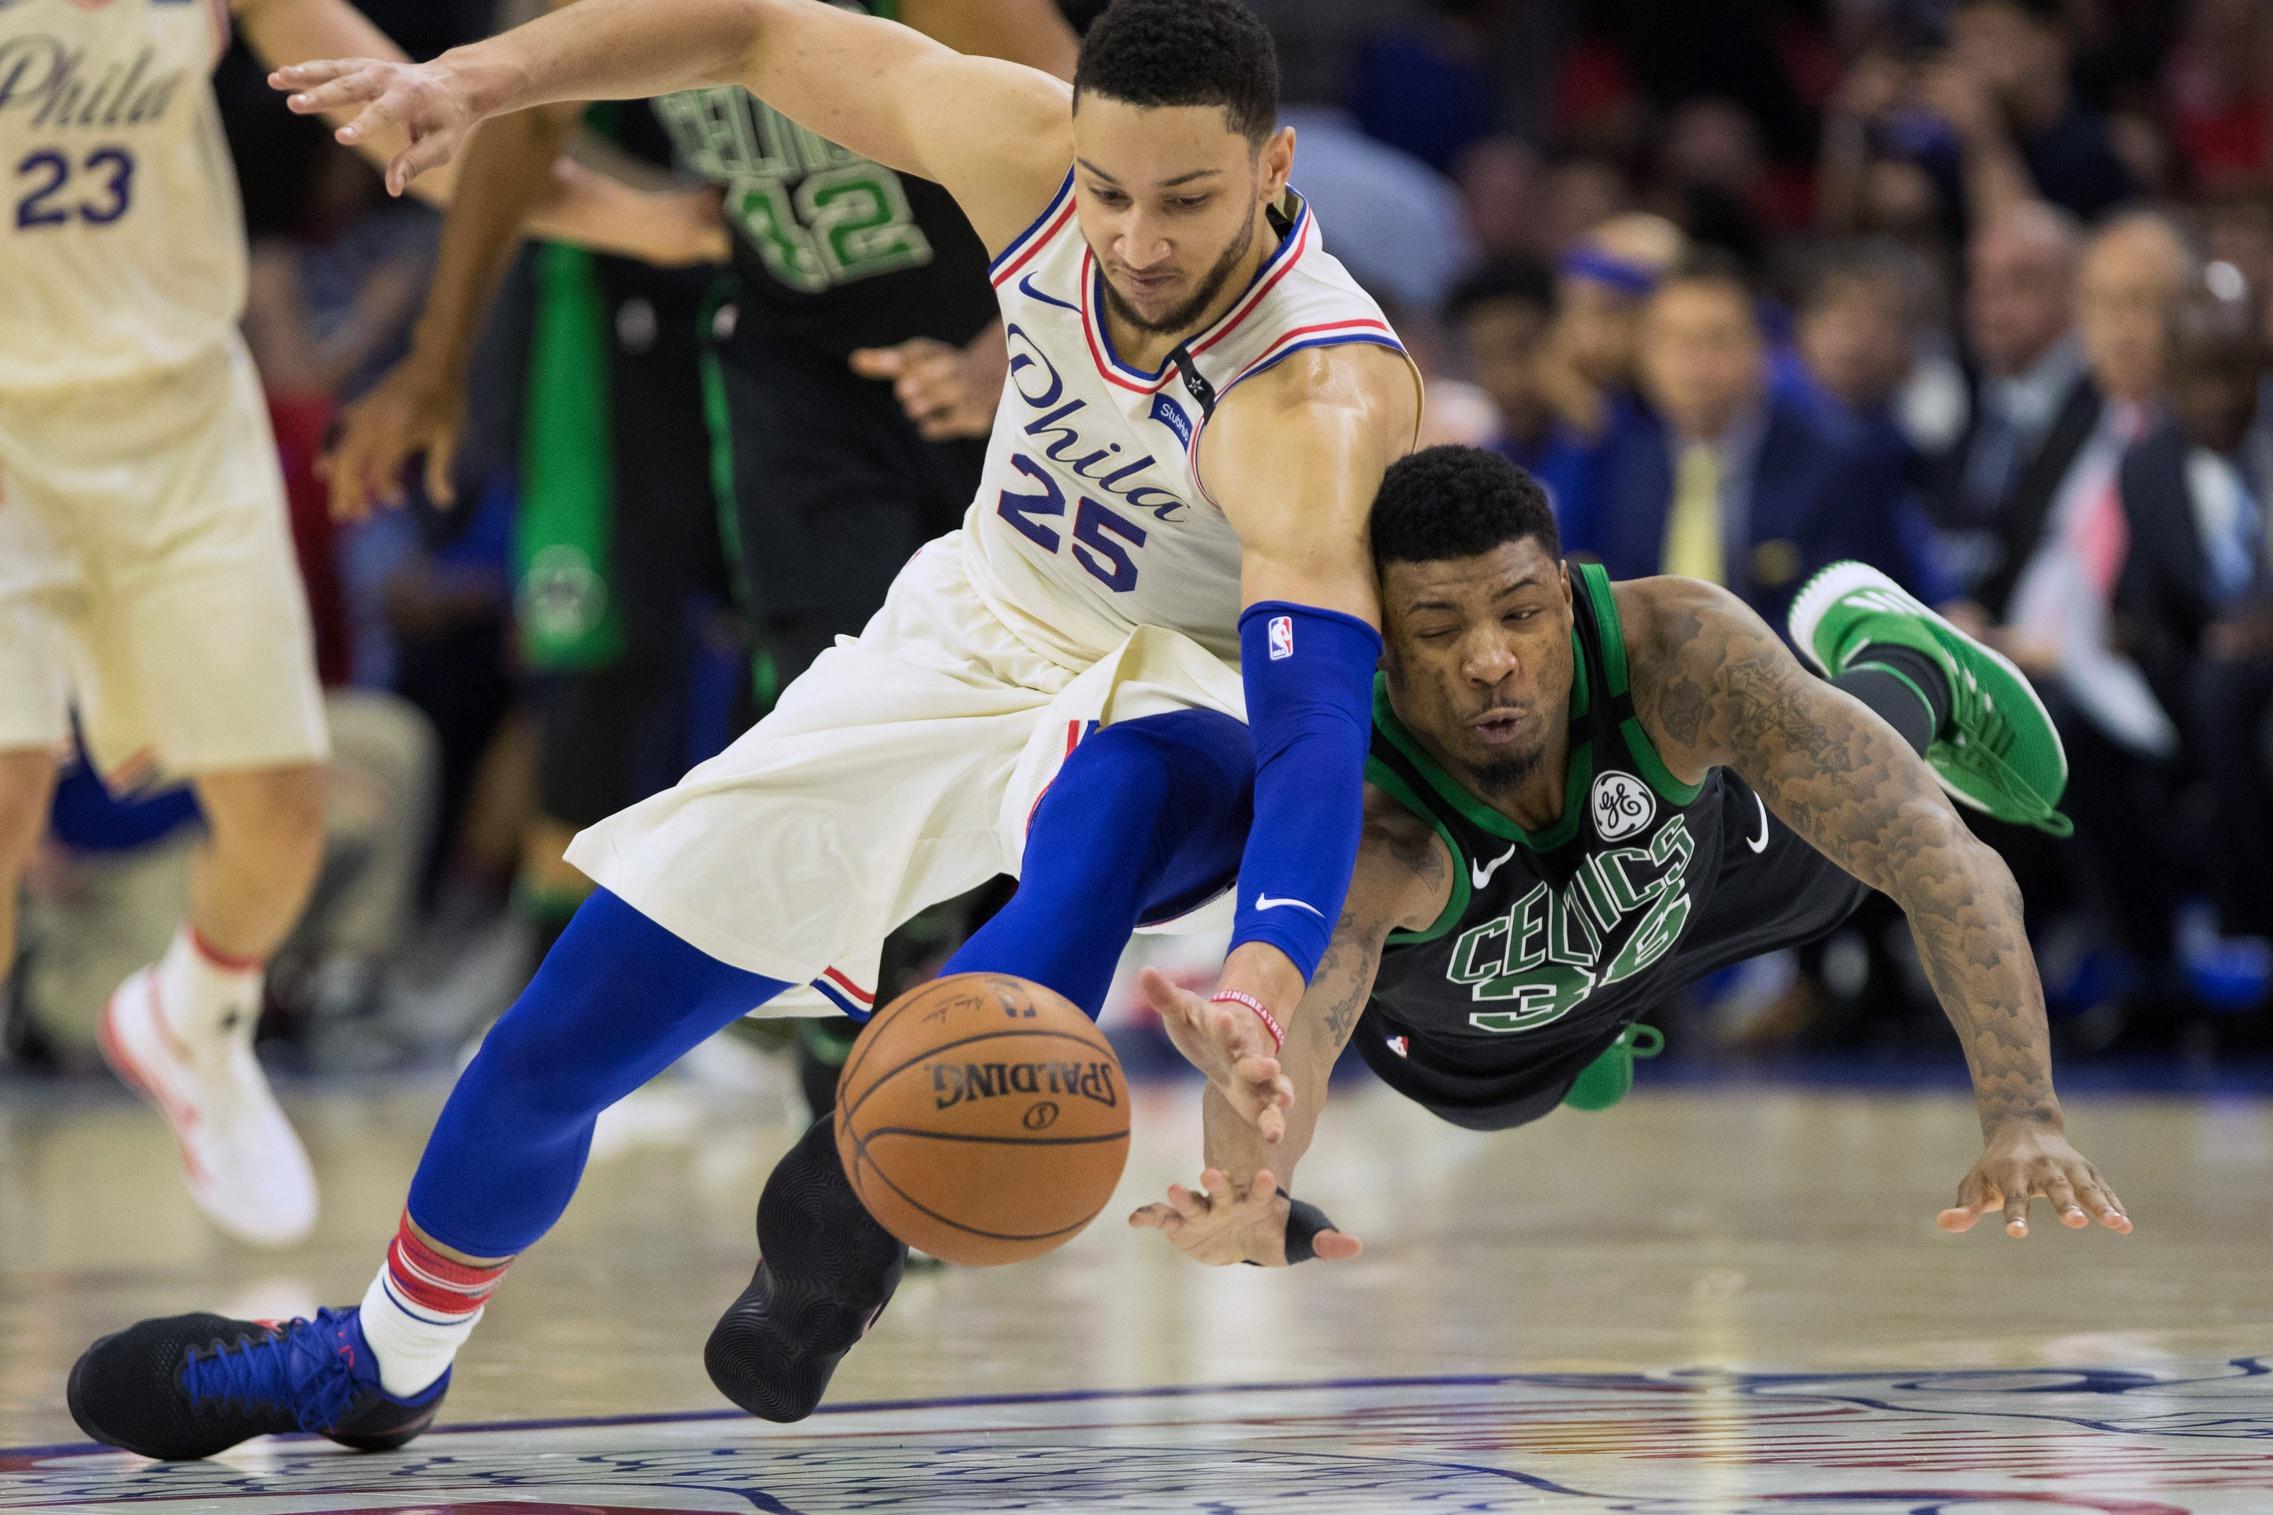 Your Morning Dump... Where the Celtics are tough